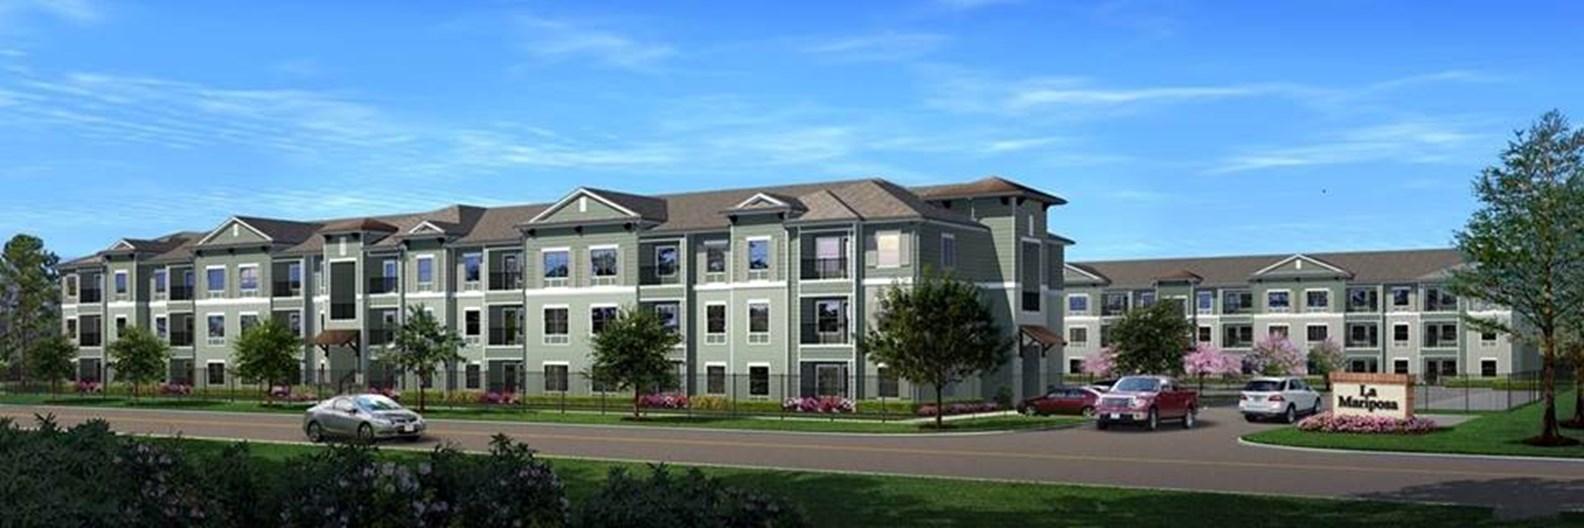 La Mariposa II Apartments